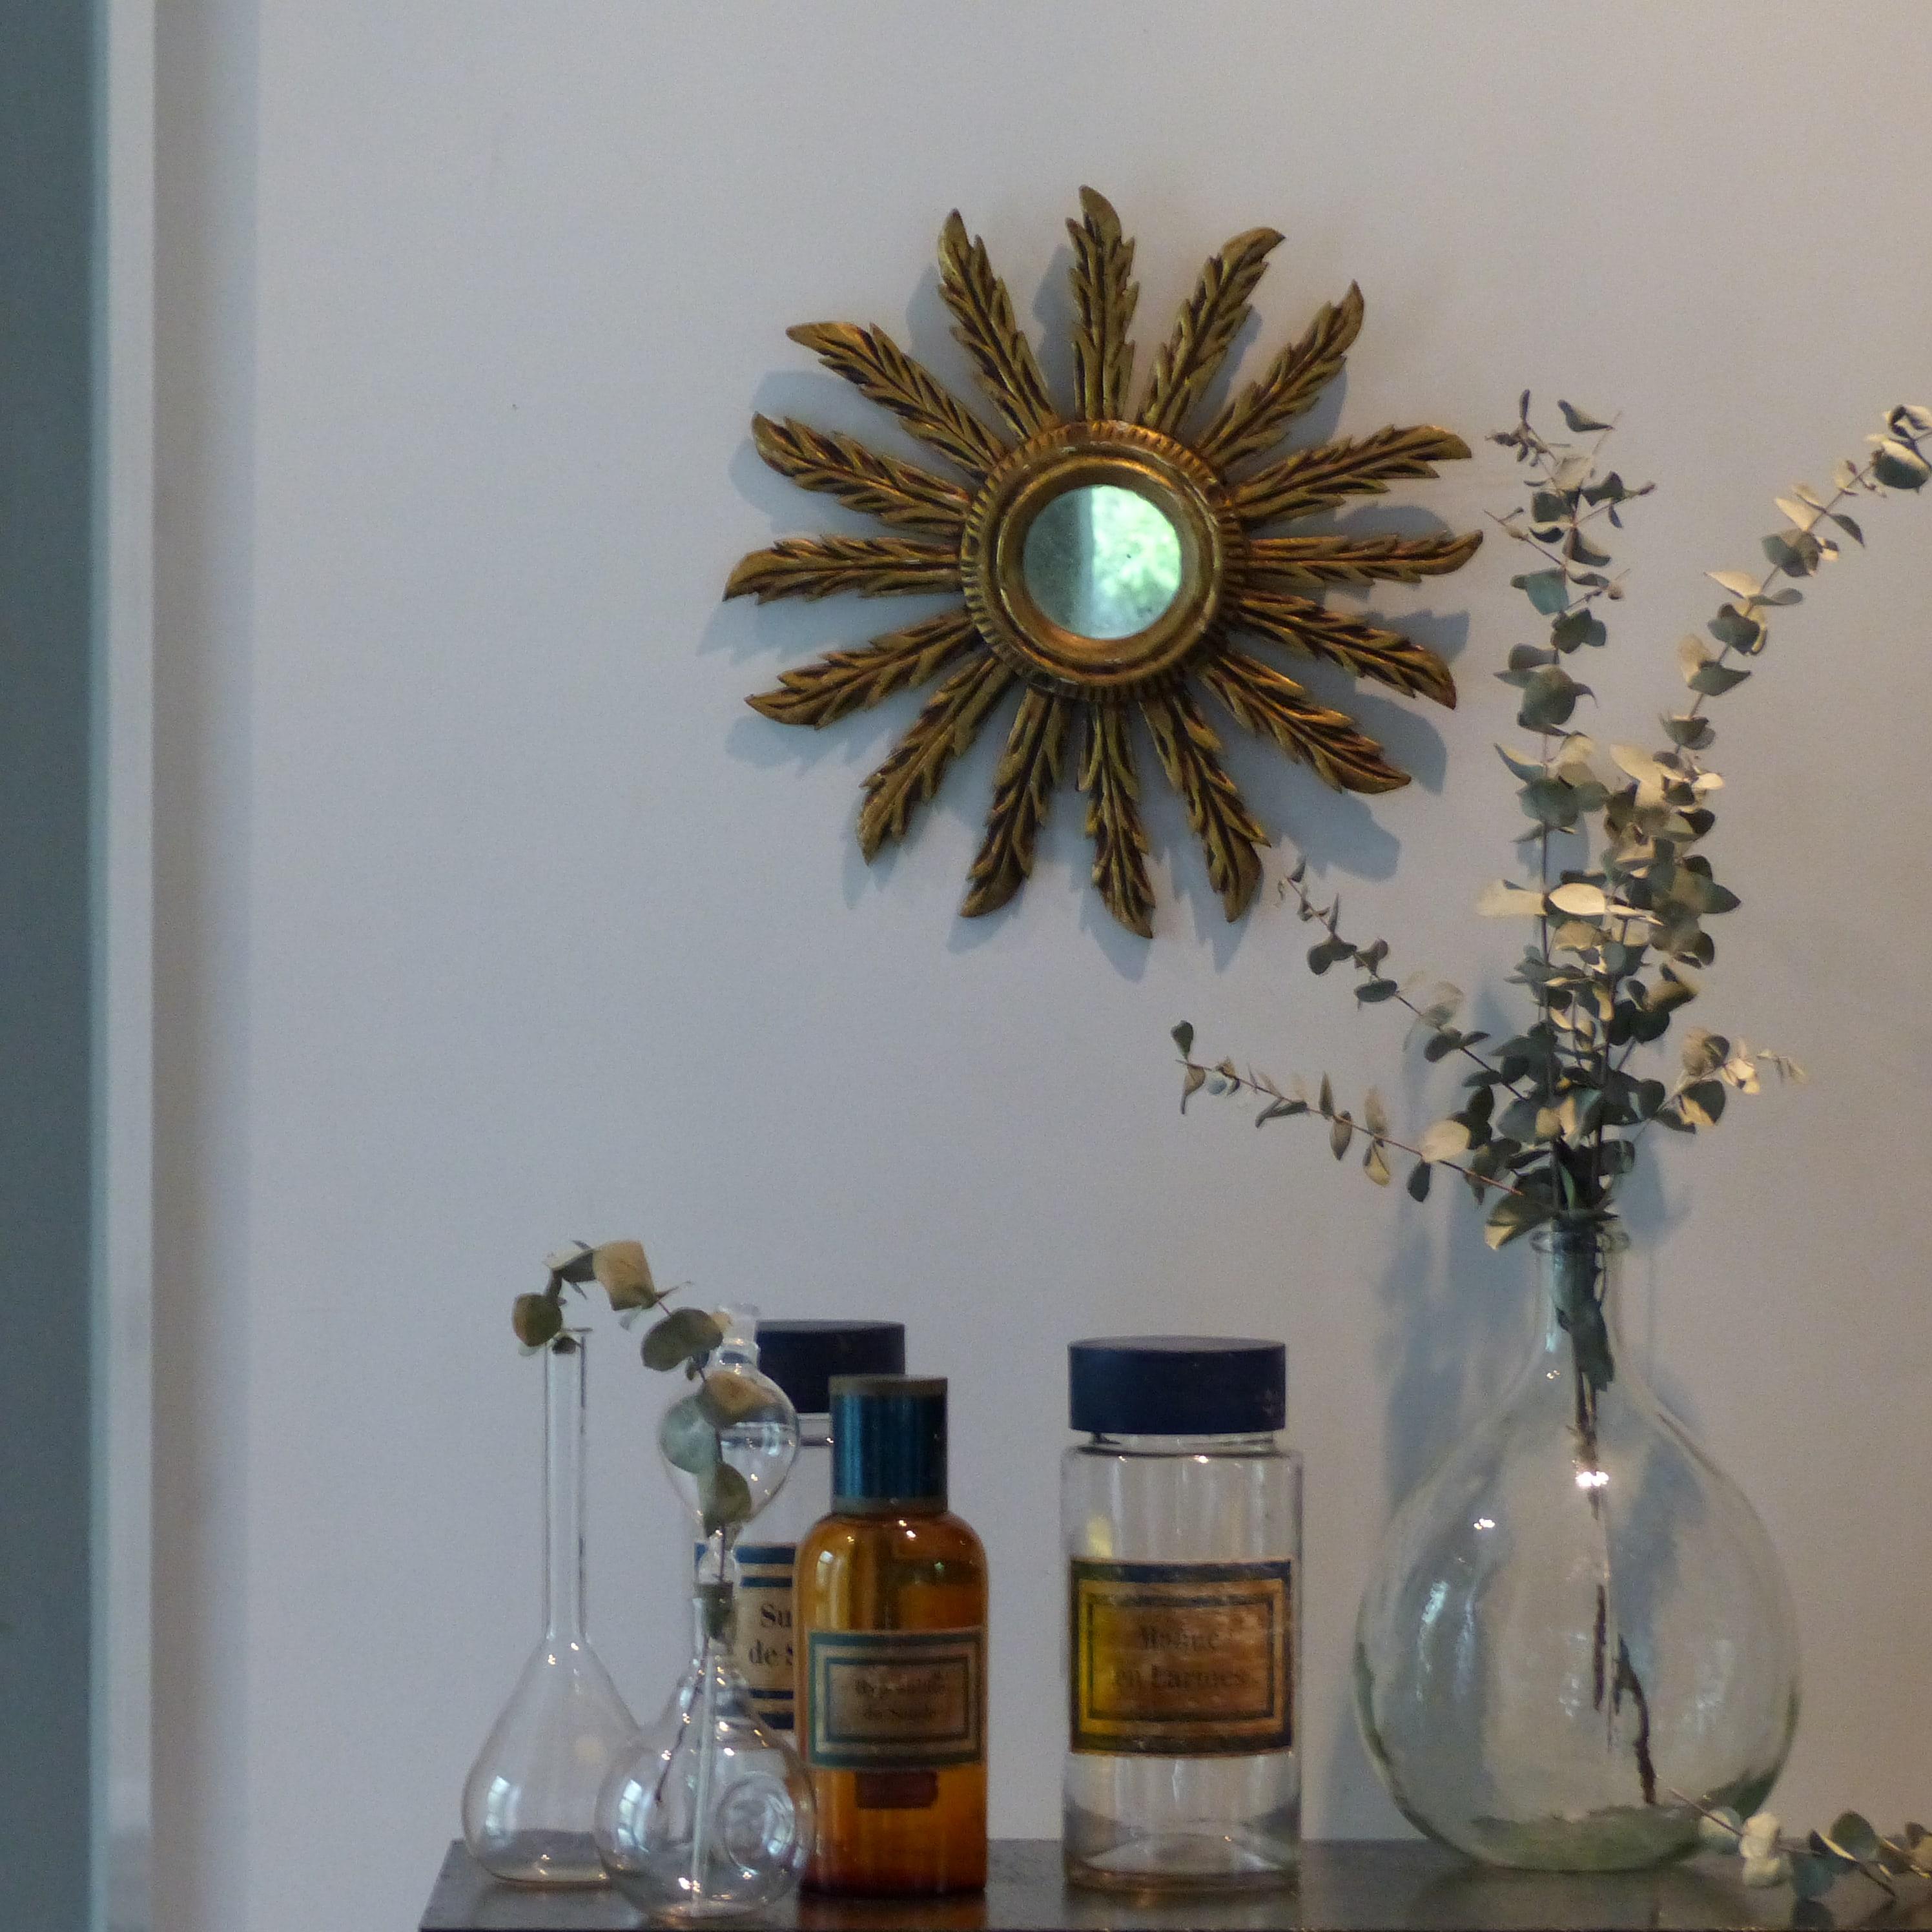 miroir soleil en bois dor lignedebrocante brocante en ligne chine pour vous meubles vintage. Black Bedroom Furniture Sets. Home Design Ideas